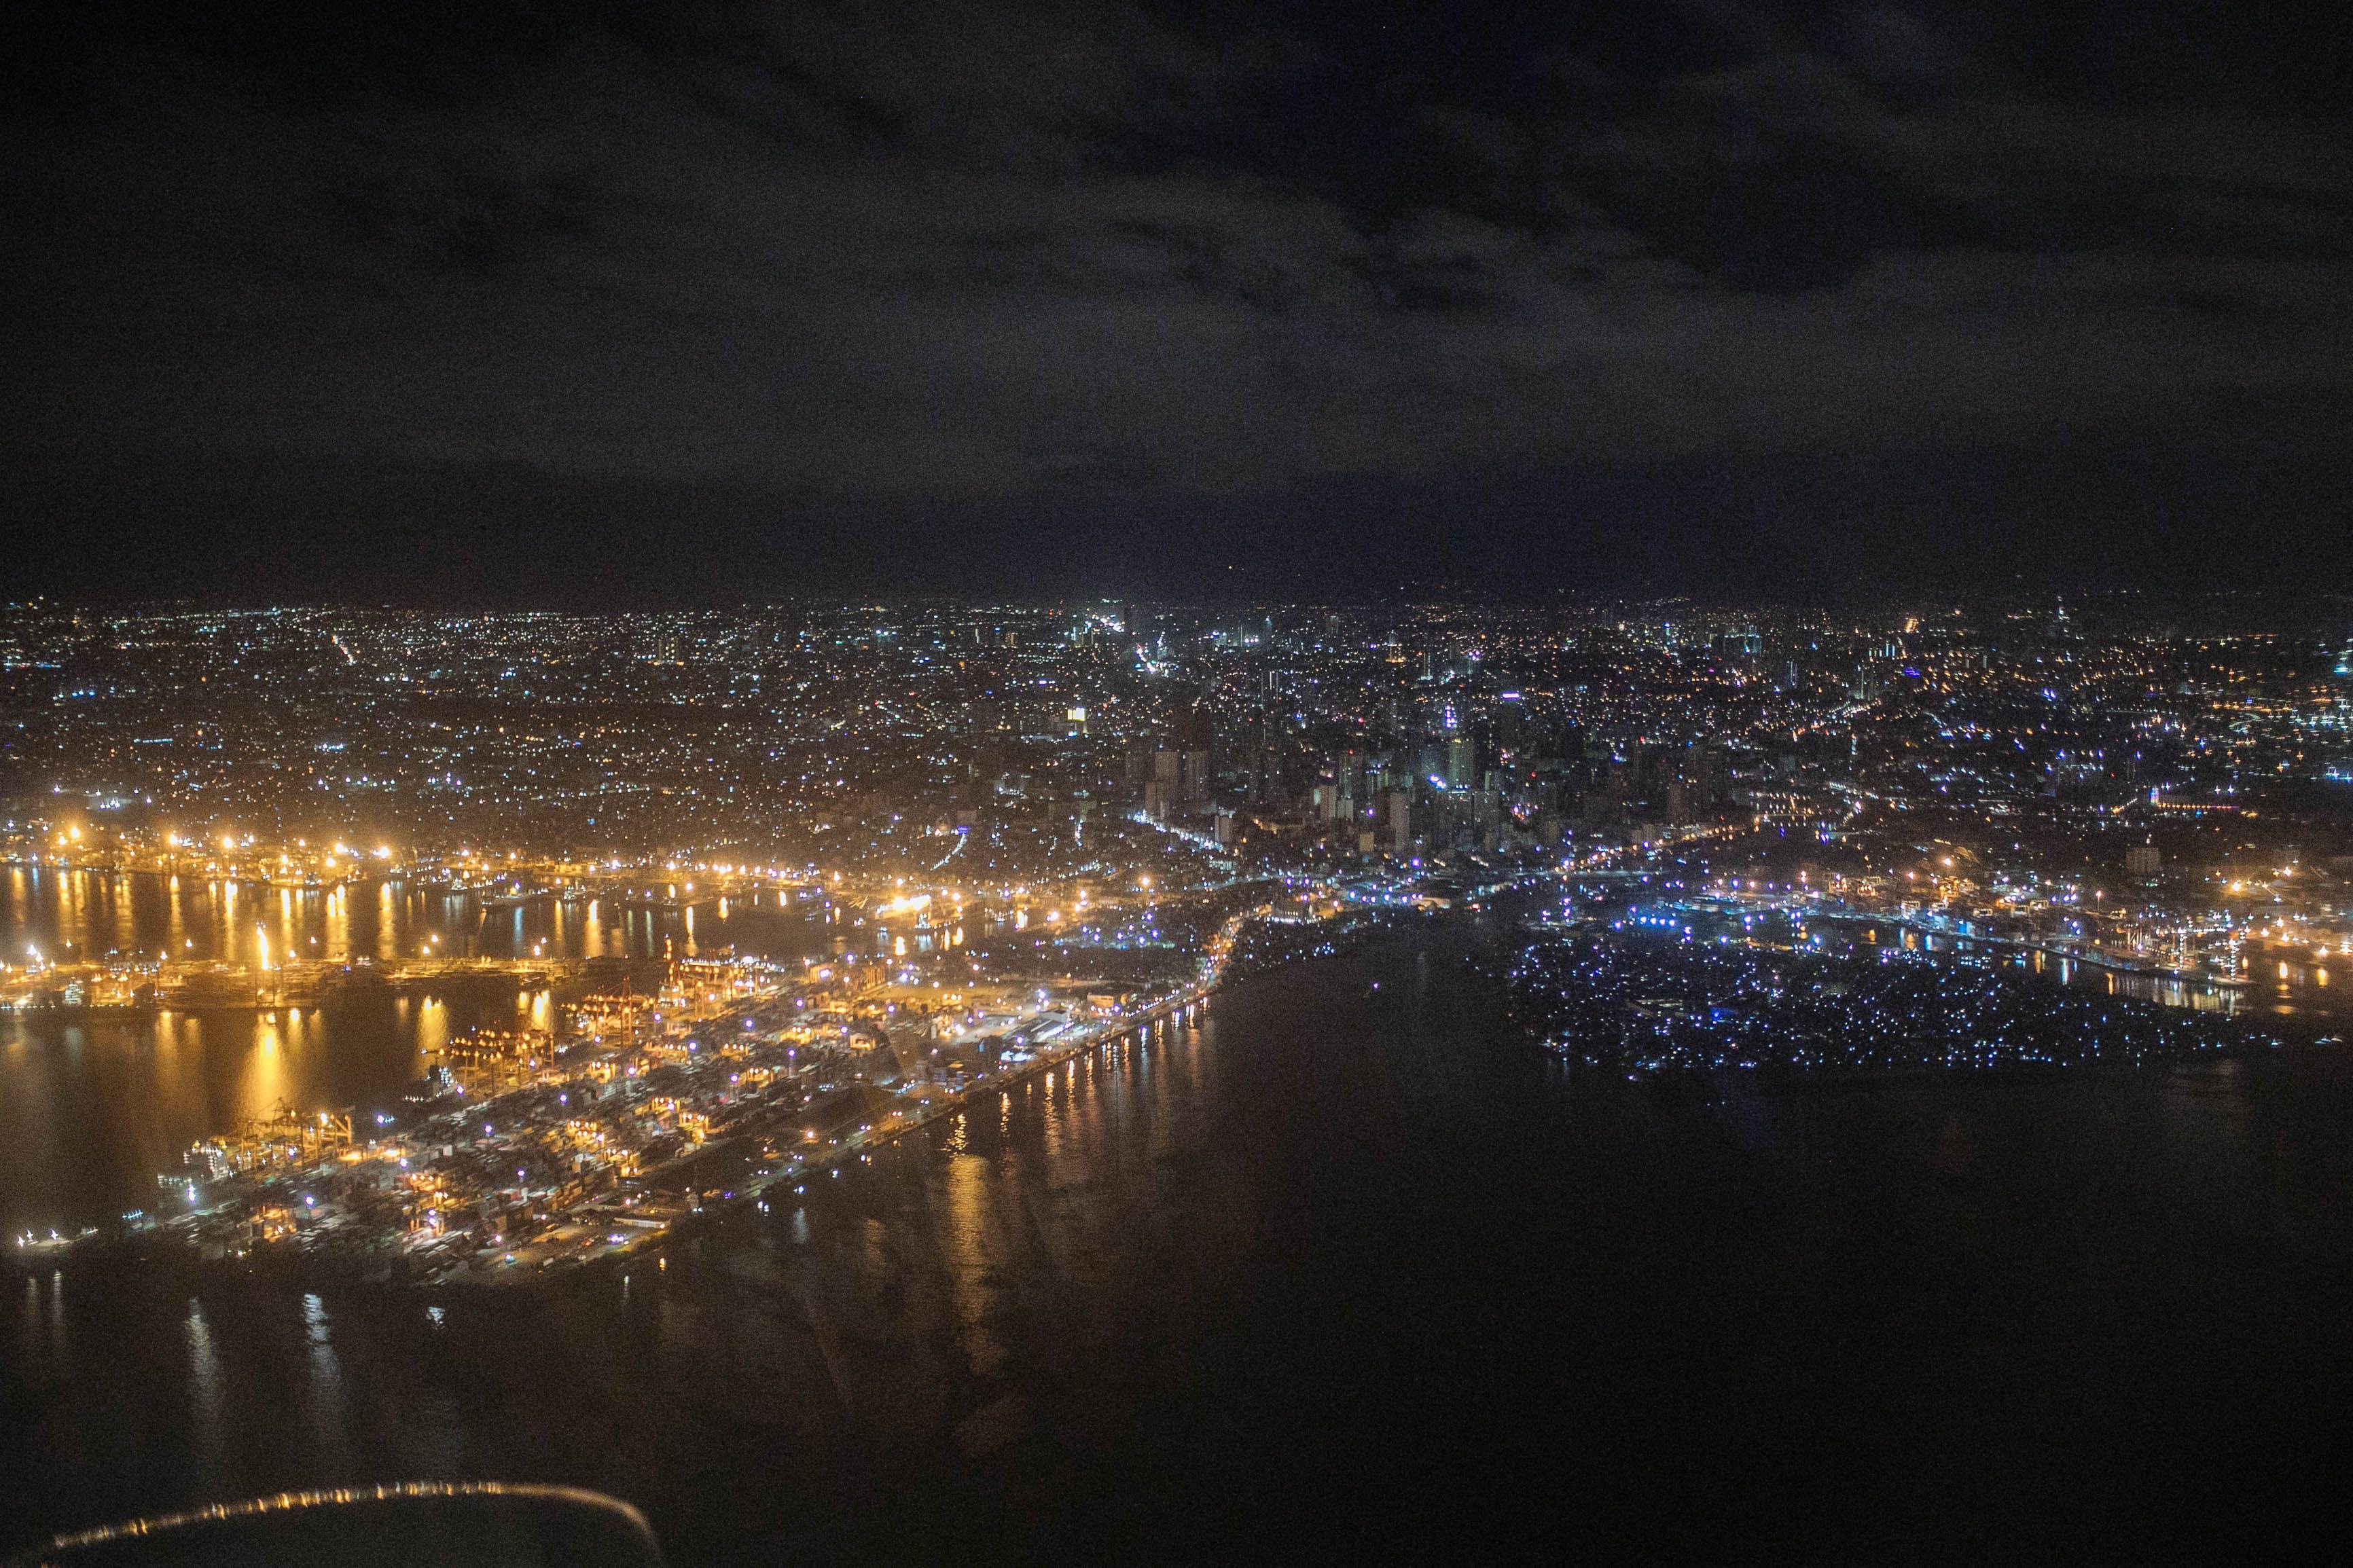 Free stock photo of city lights, night photography